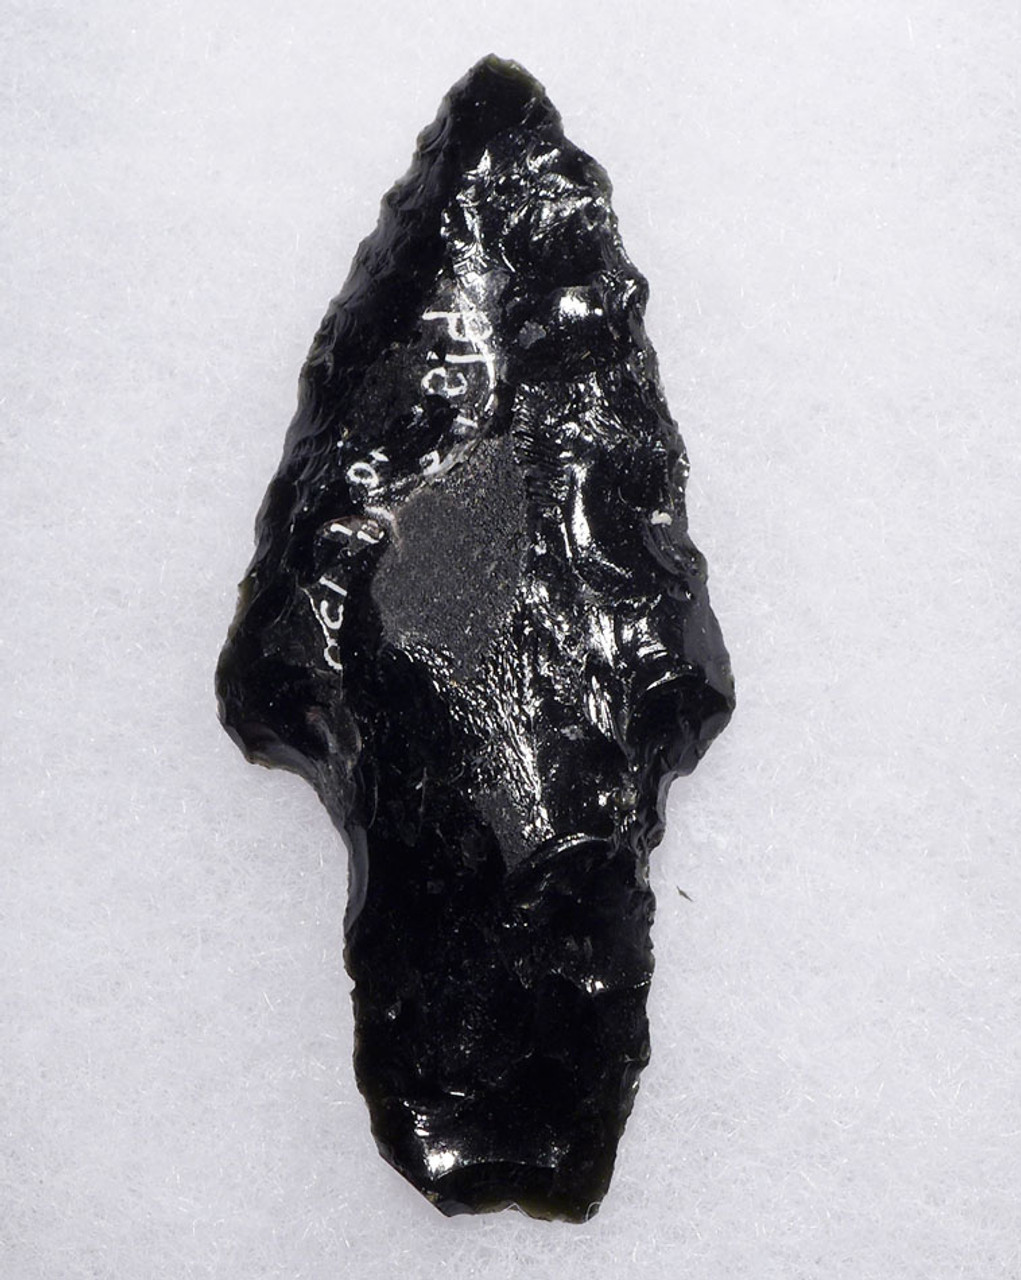 LARGE PRE-COLUMBIAN OBSIDIAN ATLATL SPEARHEAD  *PC305